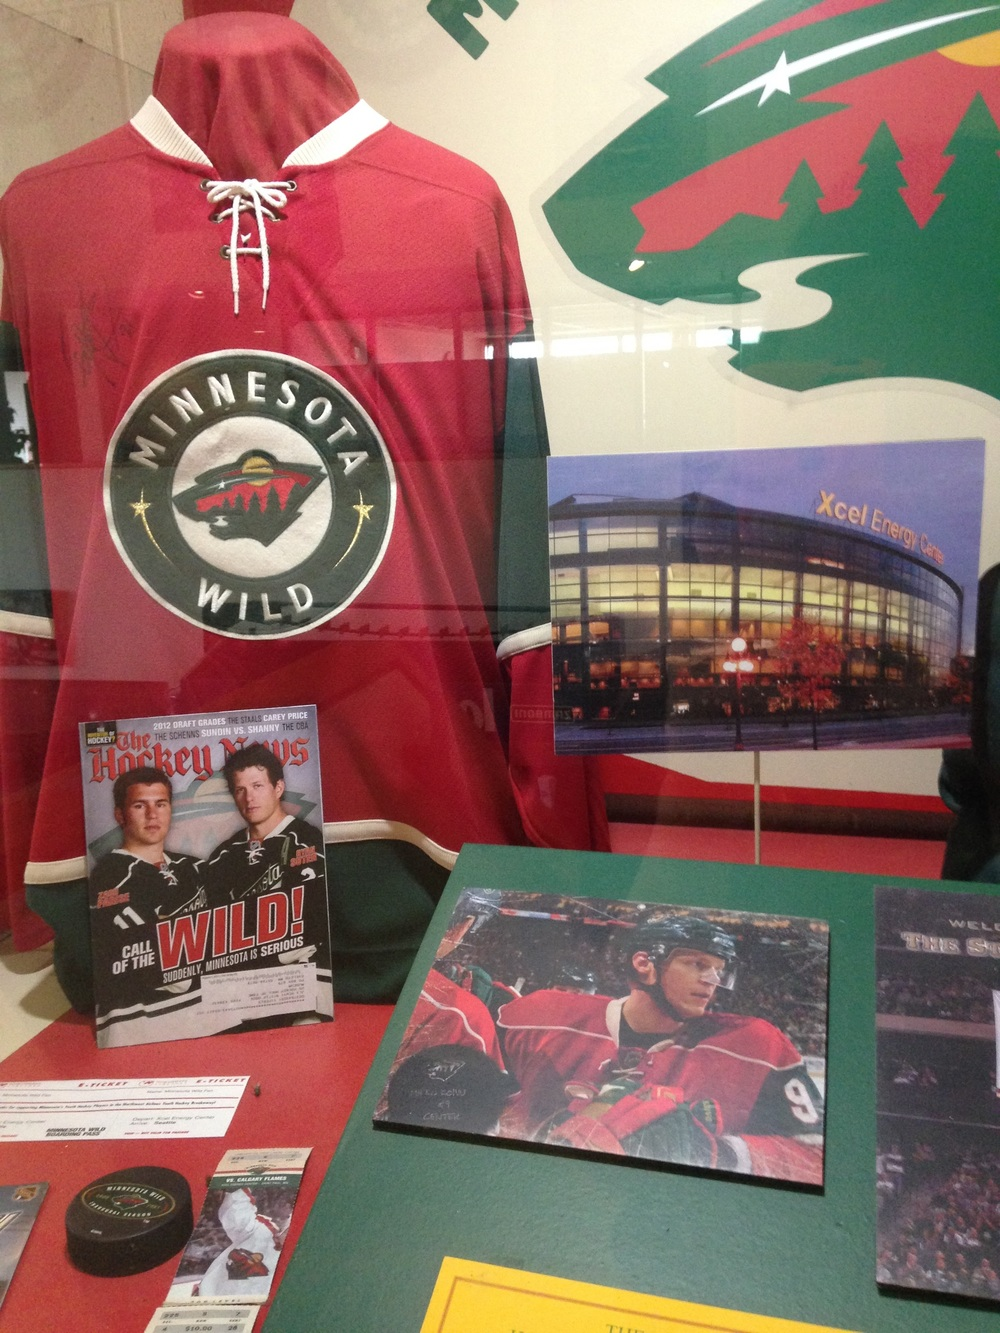 United-States-Hockey-Hall-of-Fame-Minnesota-Wild.jpg